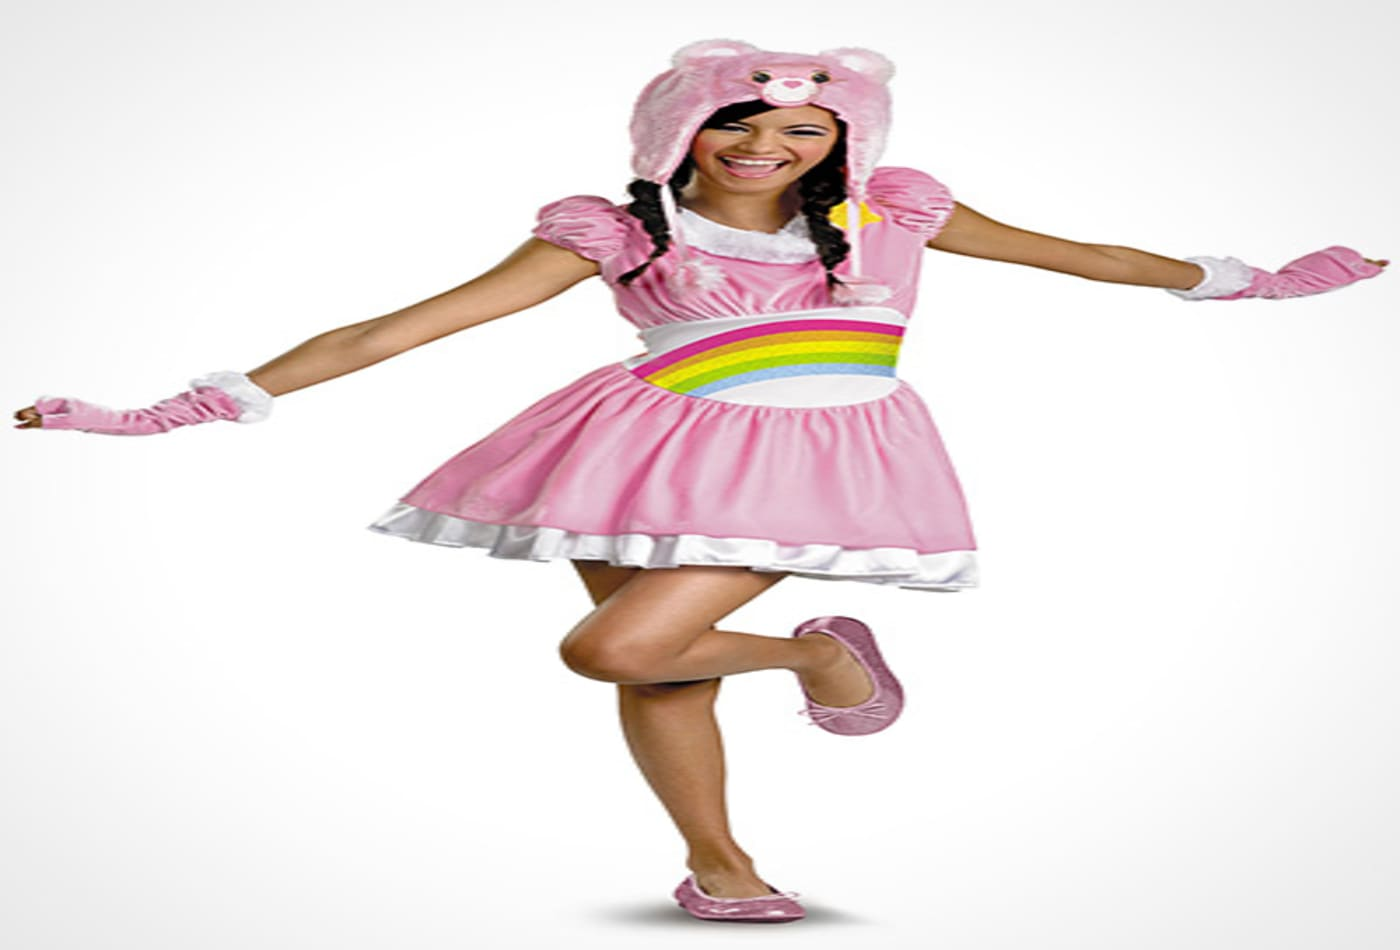 trendy-halloween-adult-2012-careBear.jpg